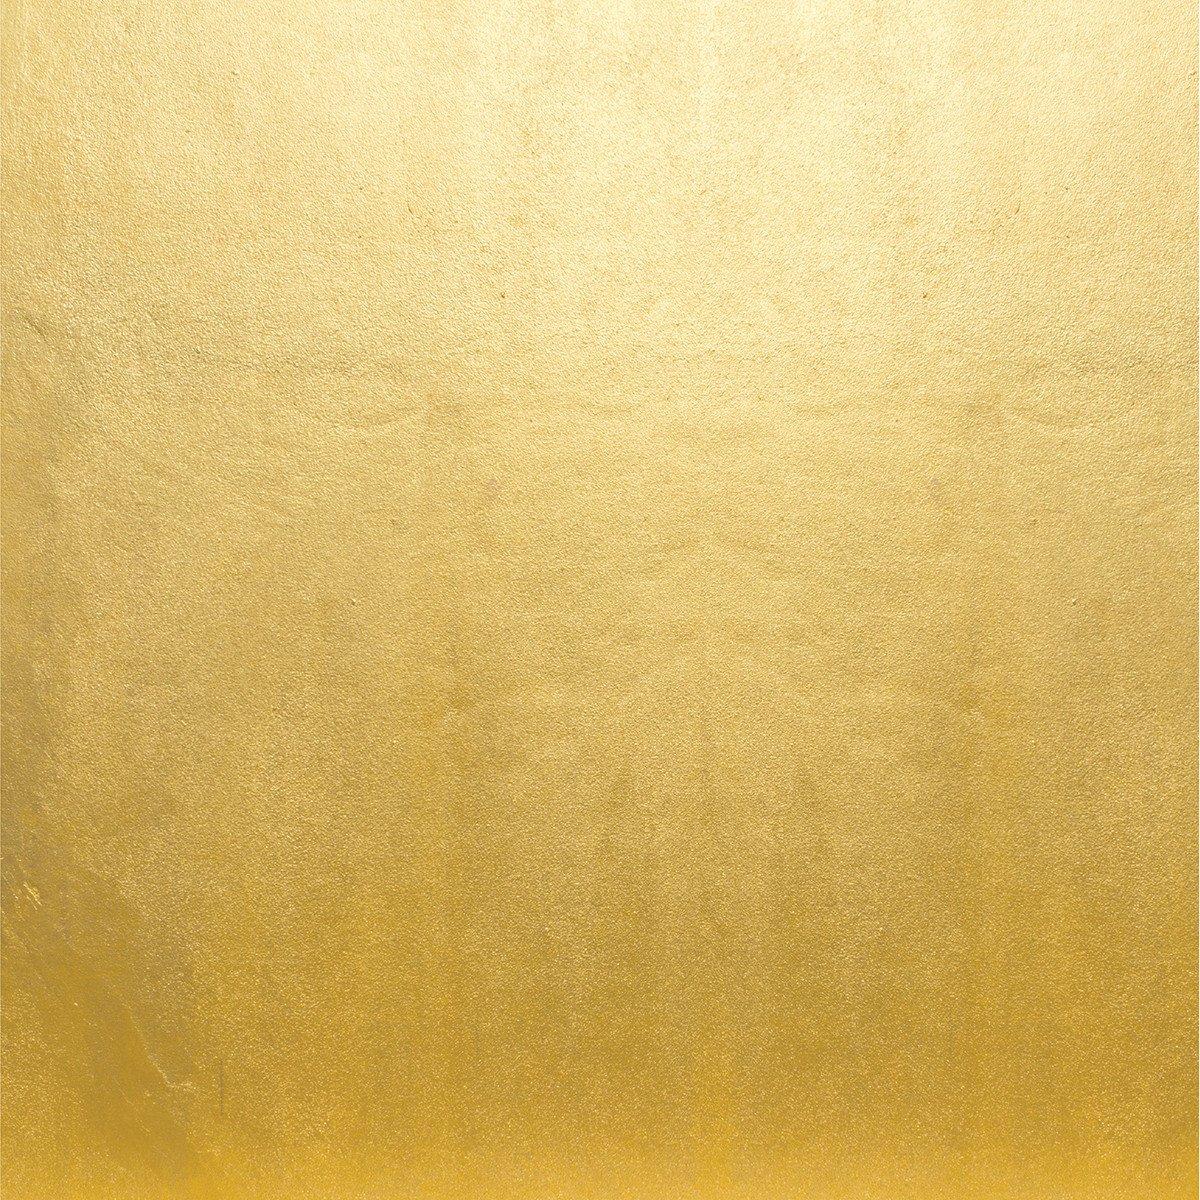 Gold Foil Texture Free Music Gold Foil 12x12 Basics